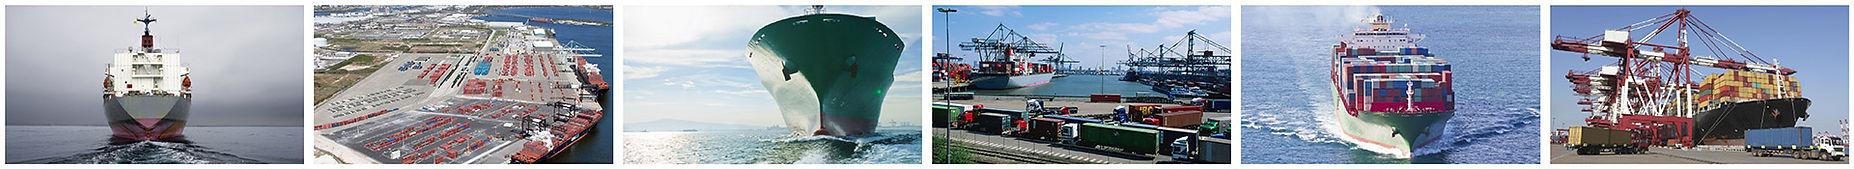 ship-chandling.jpg